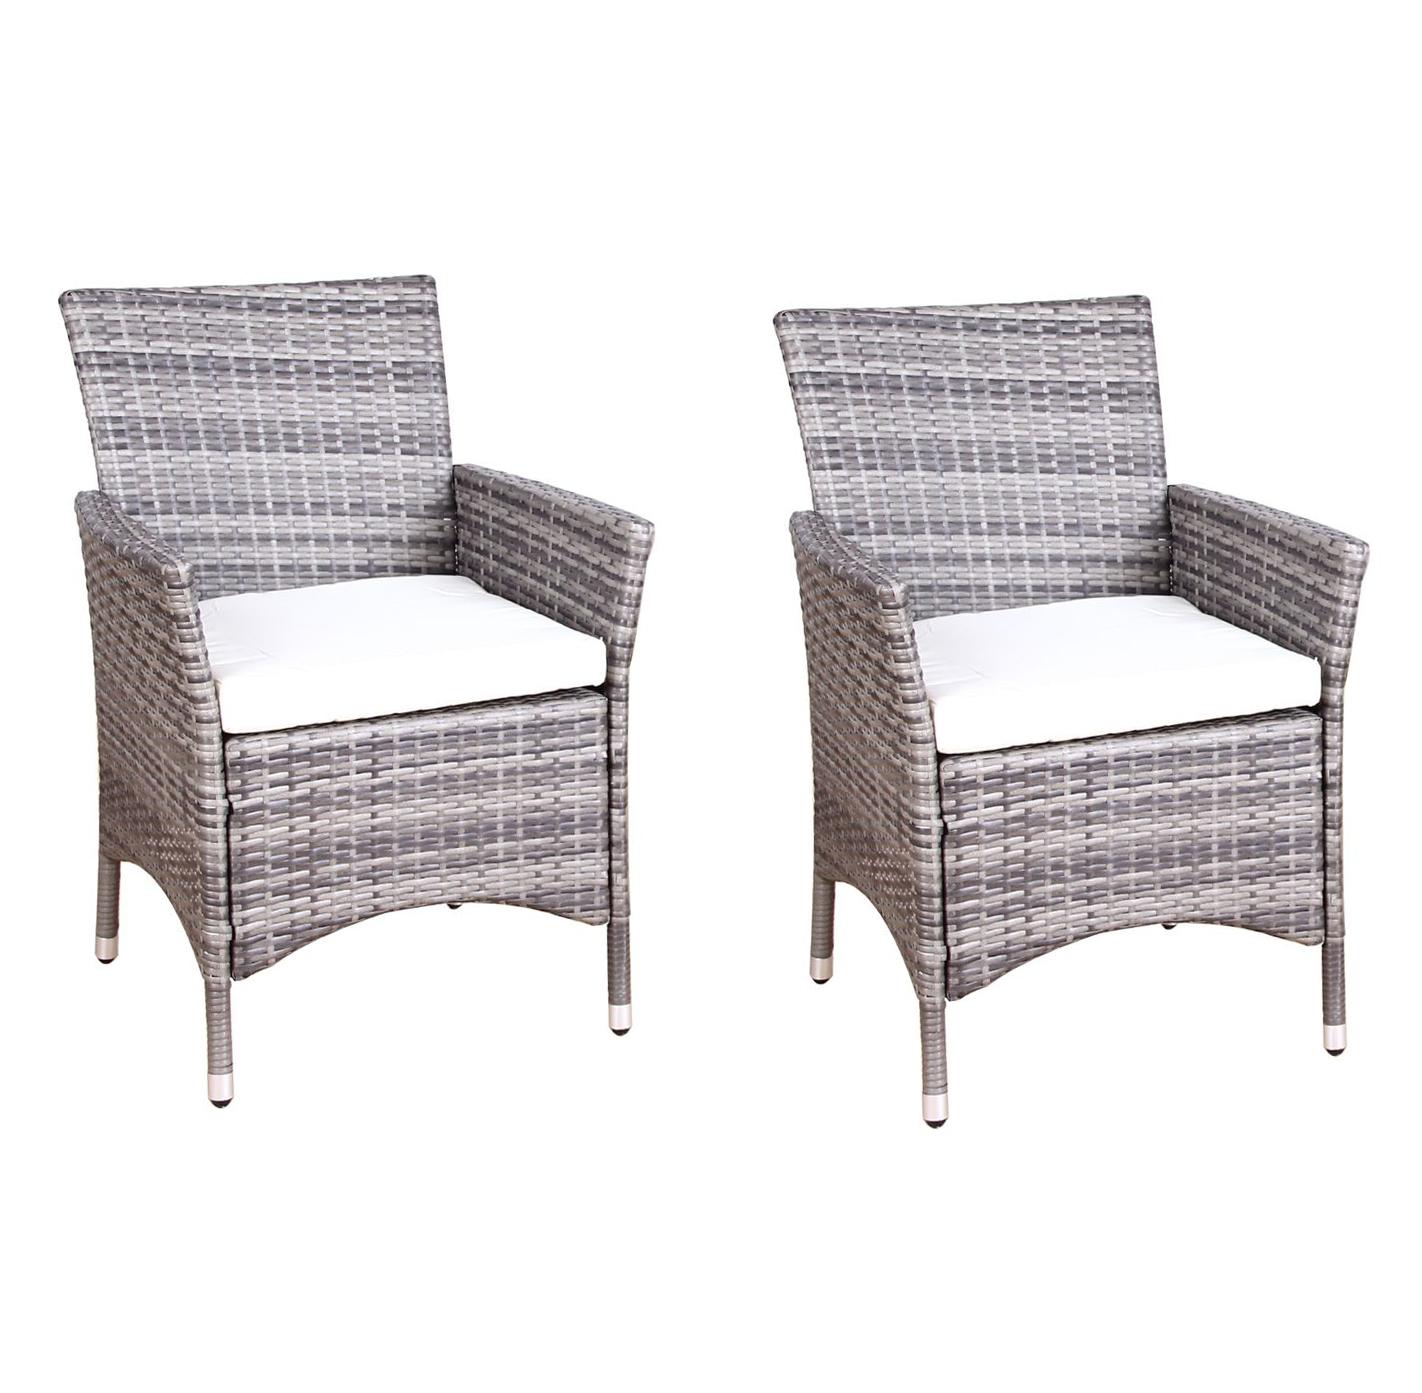 Rattan Stühle im Doppelpack grau